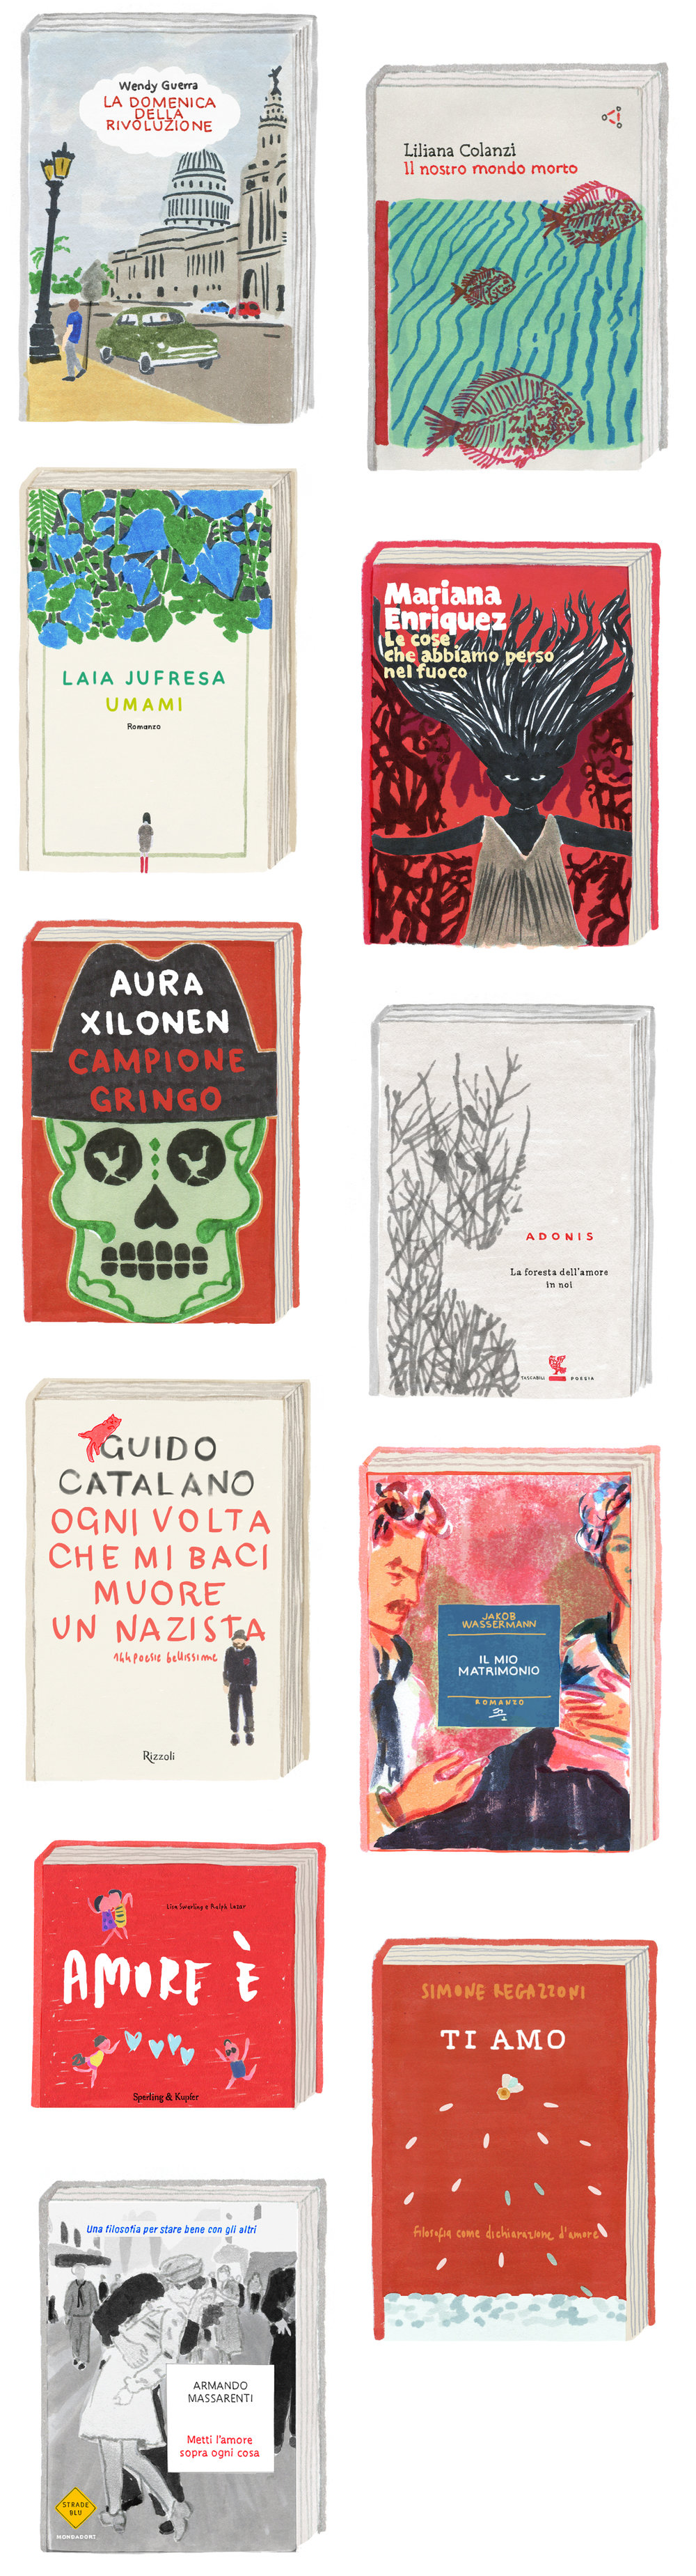 book covers web.jpg